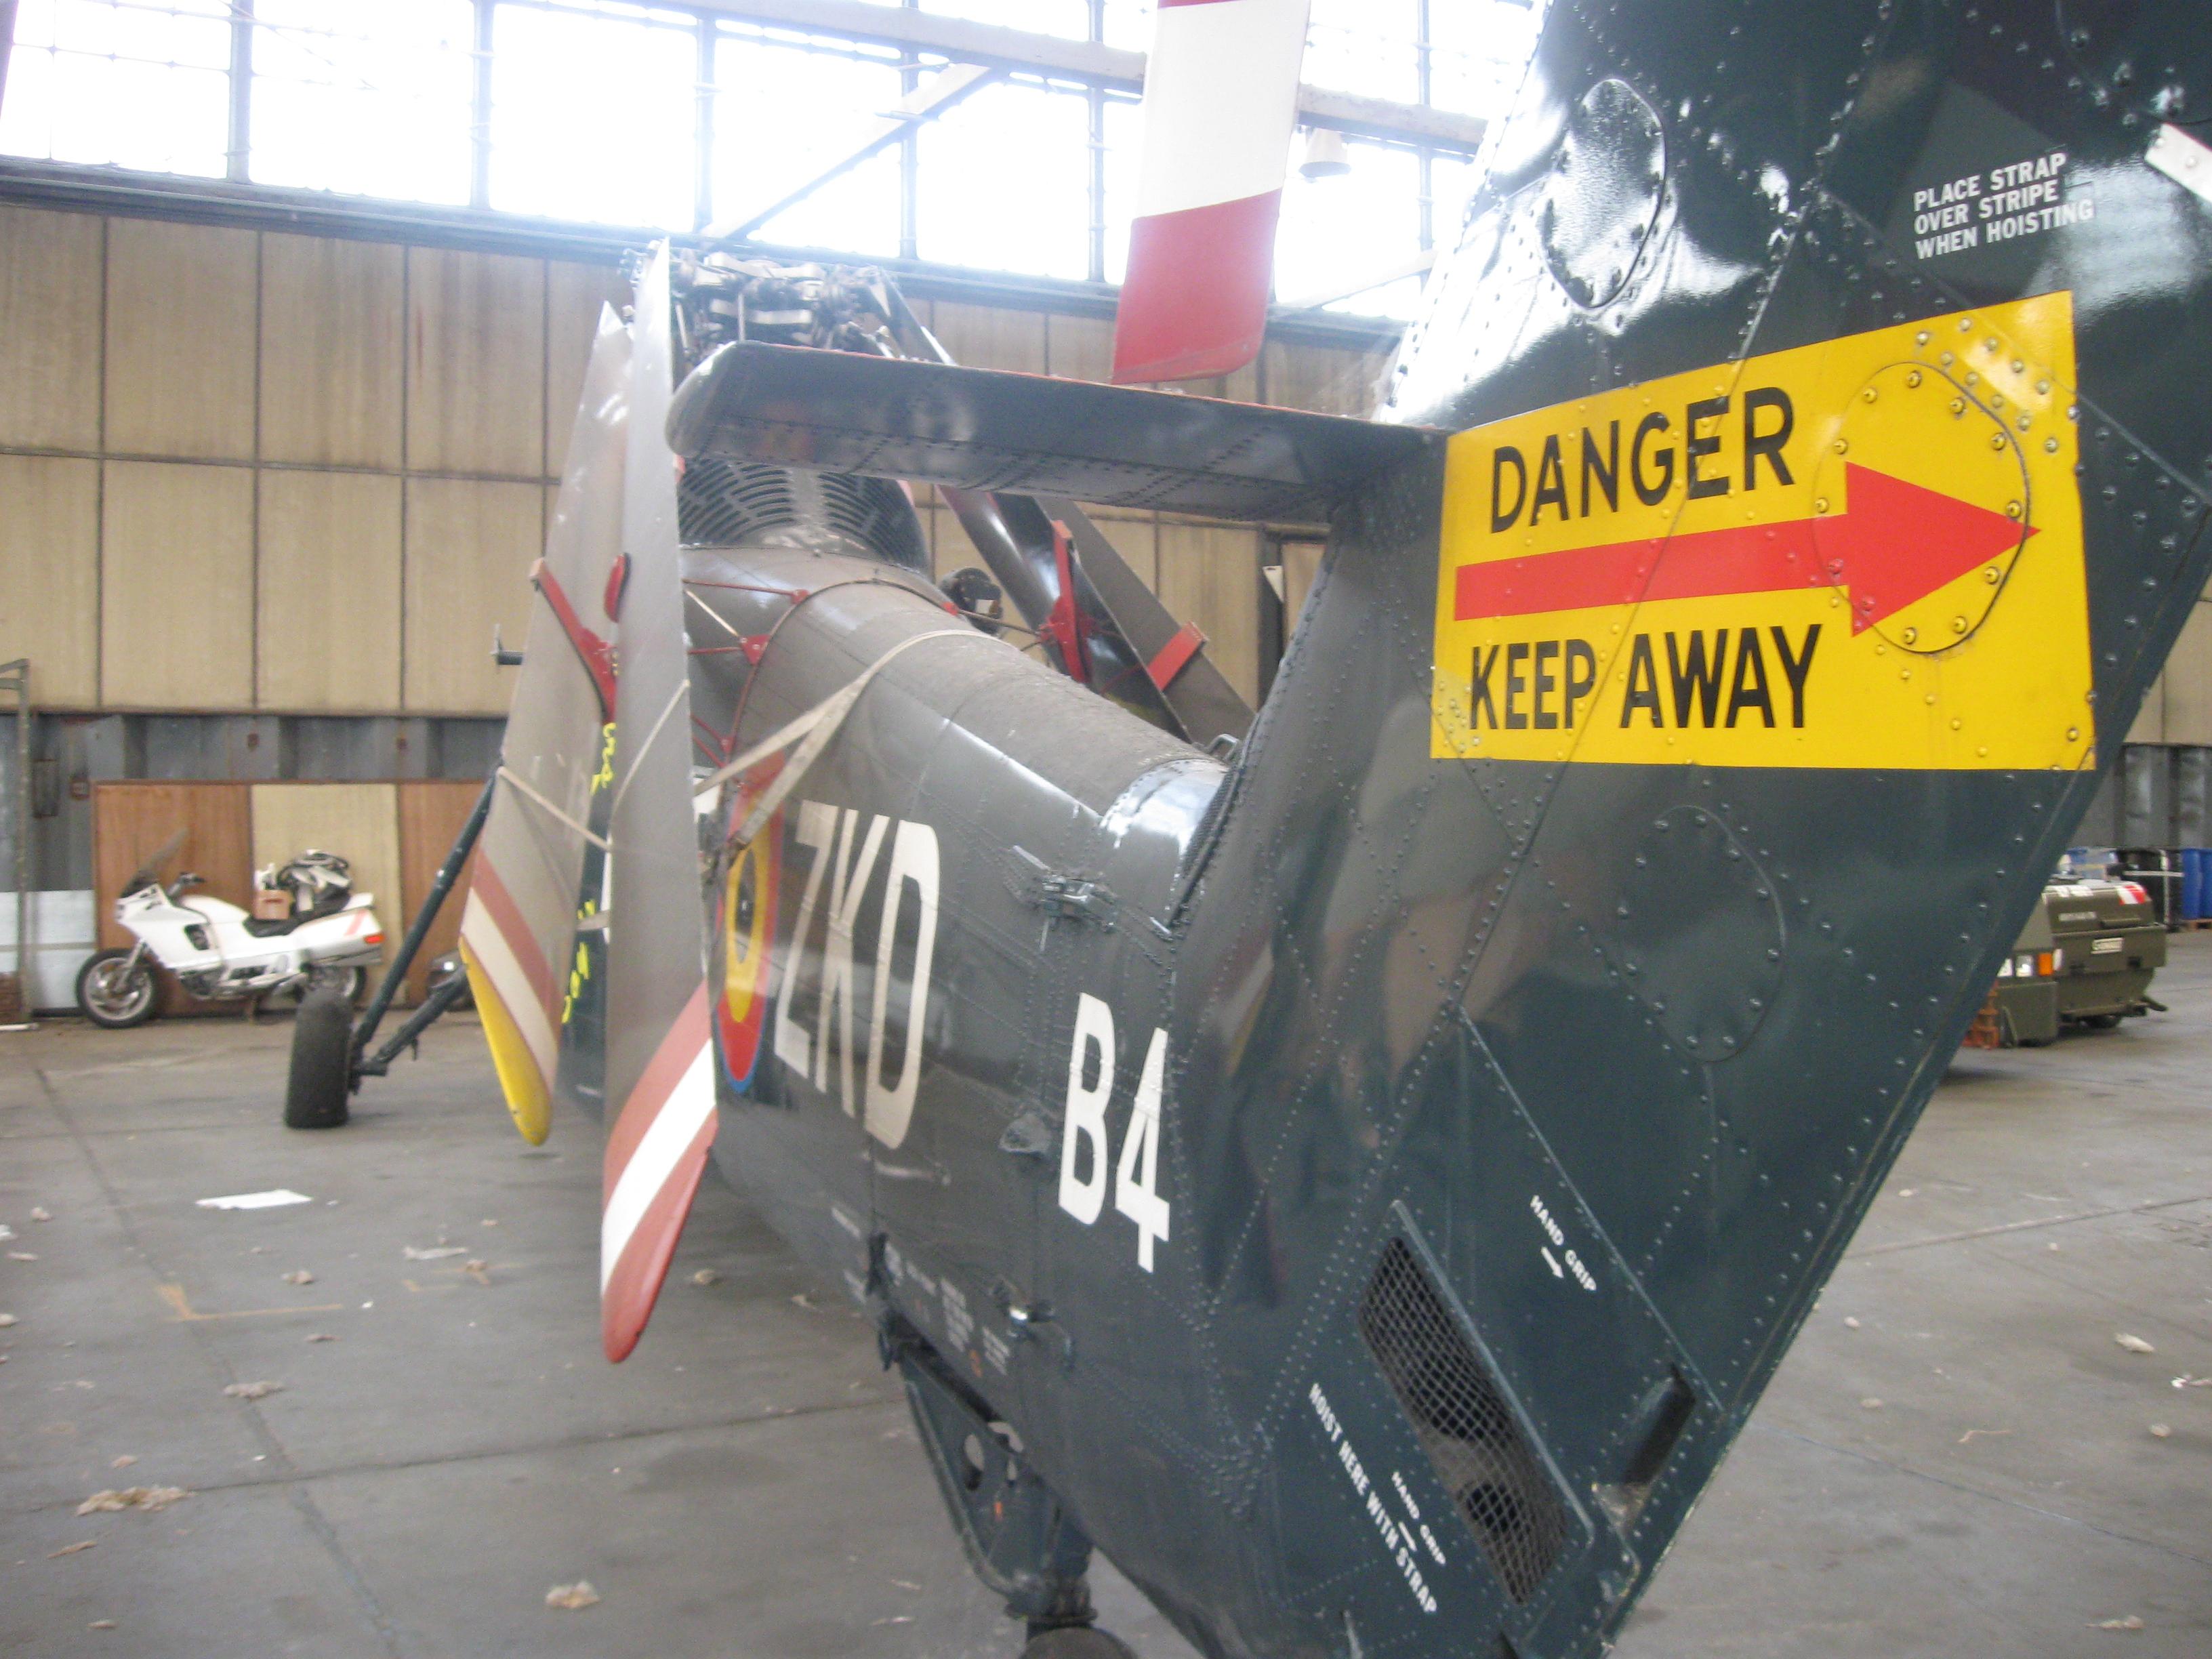 Sikorsky H-34 1008190742491050246592448